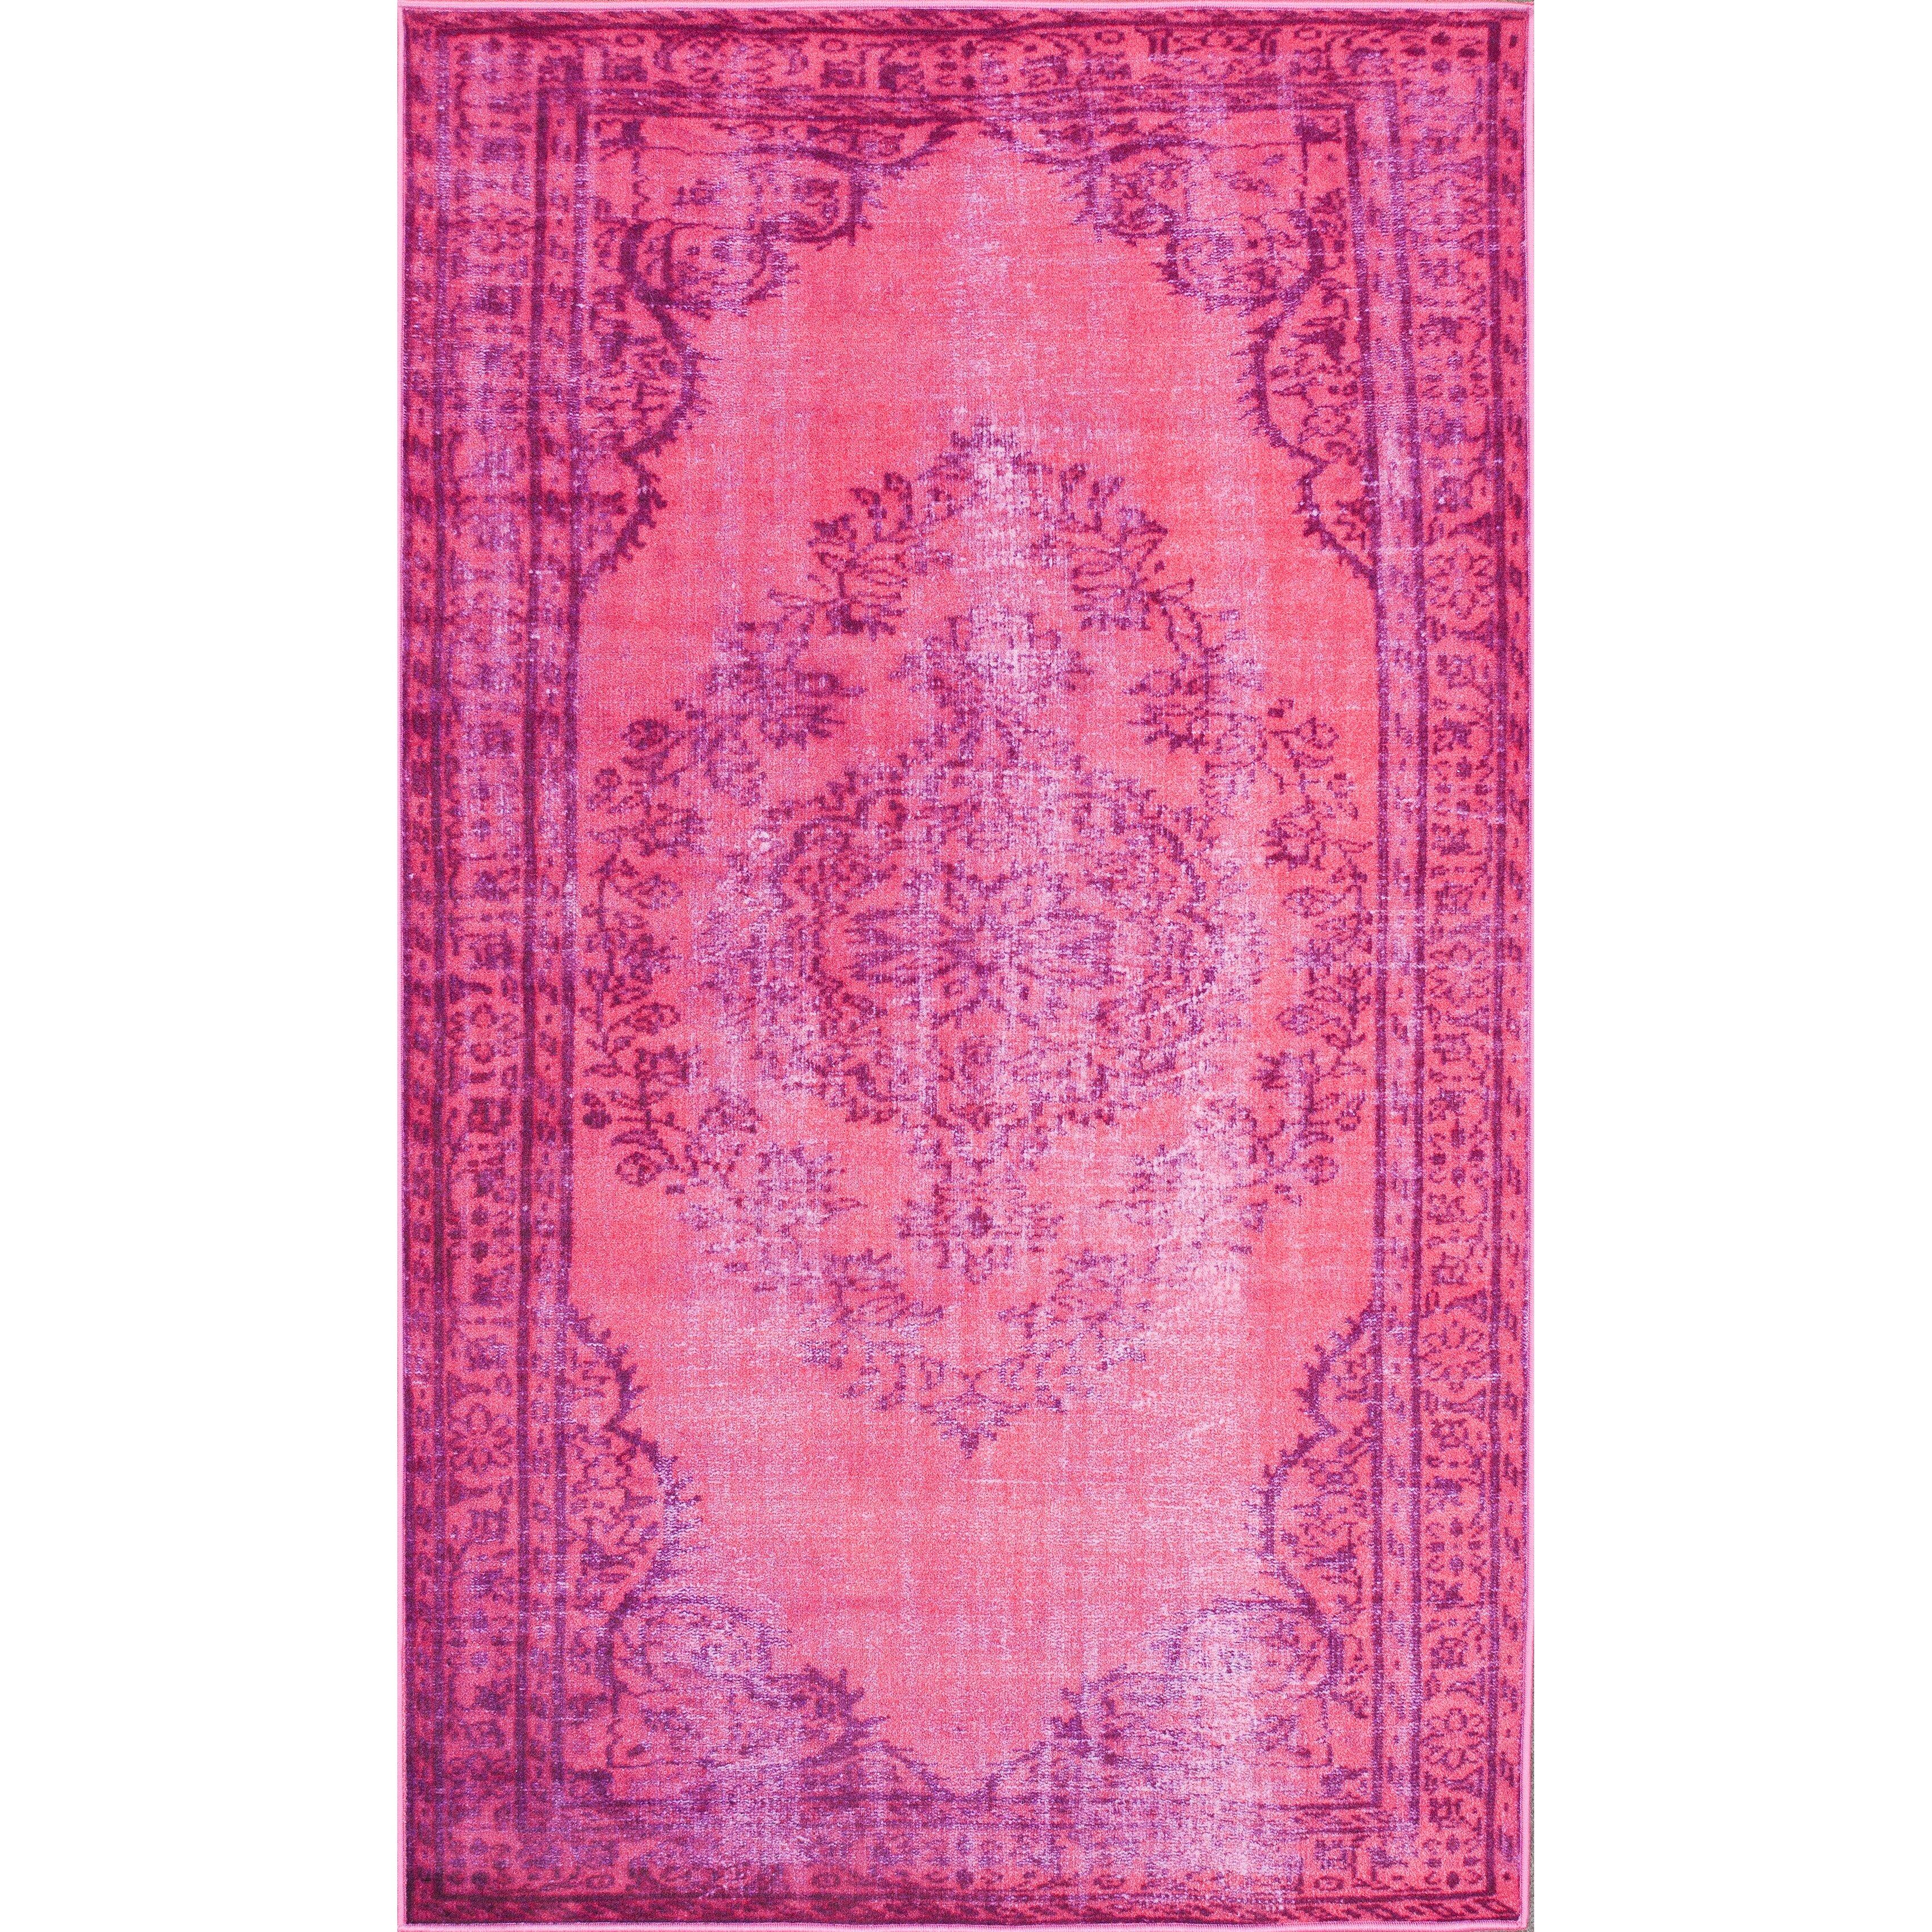 nuloom remade distressed overdyed pink area rug reviews wayfair. Black Bedroom Furniture Sets. Home Design Ideas